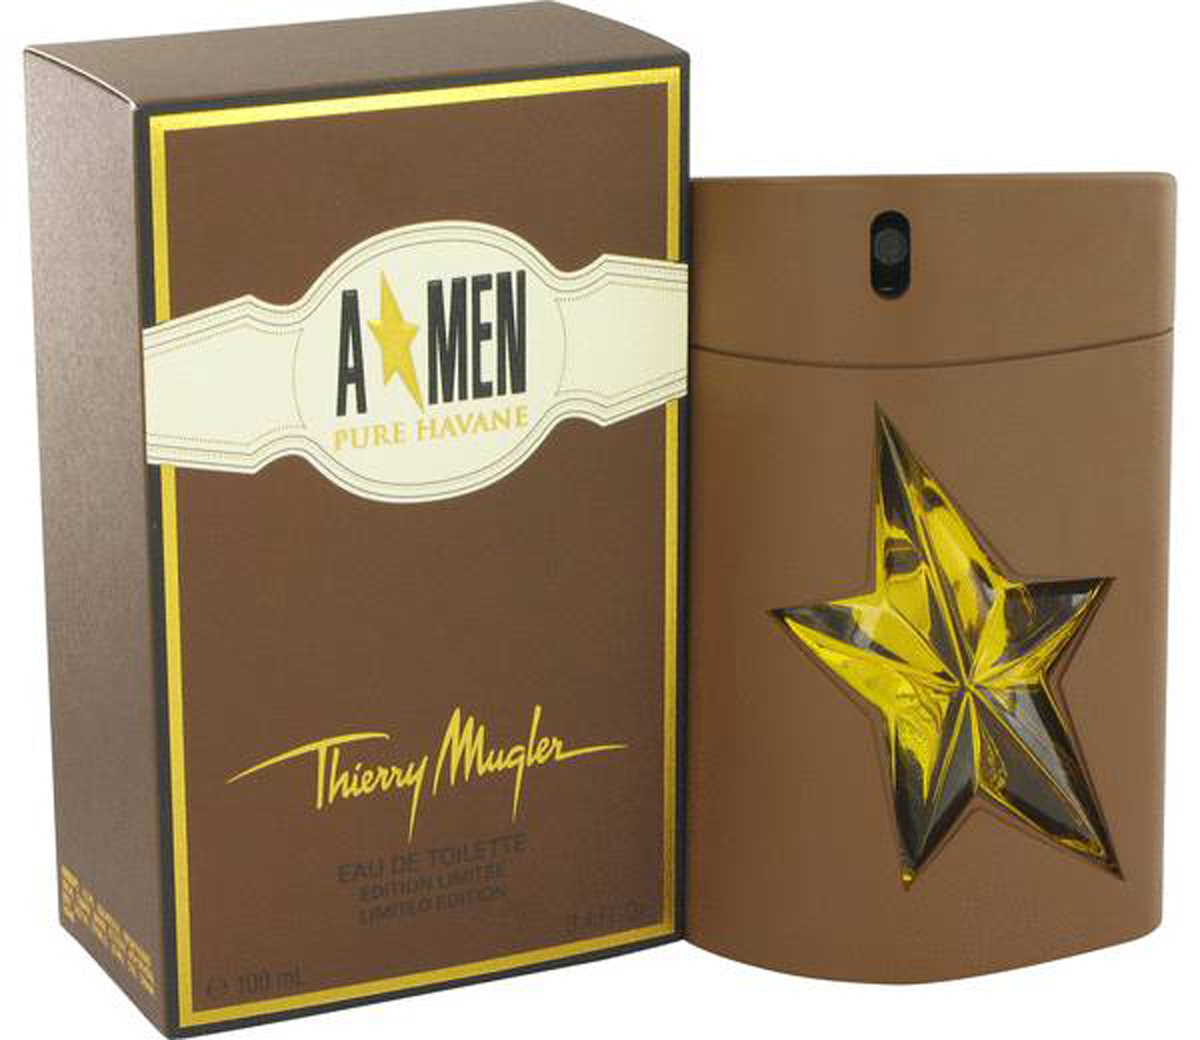 Thierry Mugler Туалетная вода A*Men Pure Havane, мужская, 100 мл